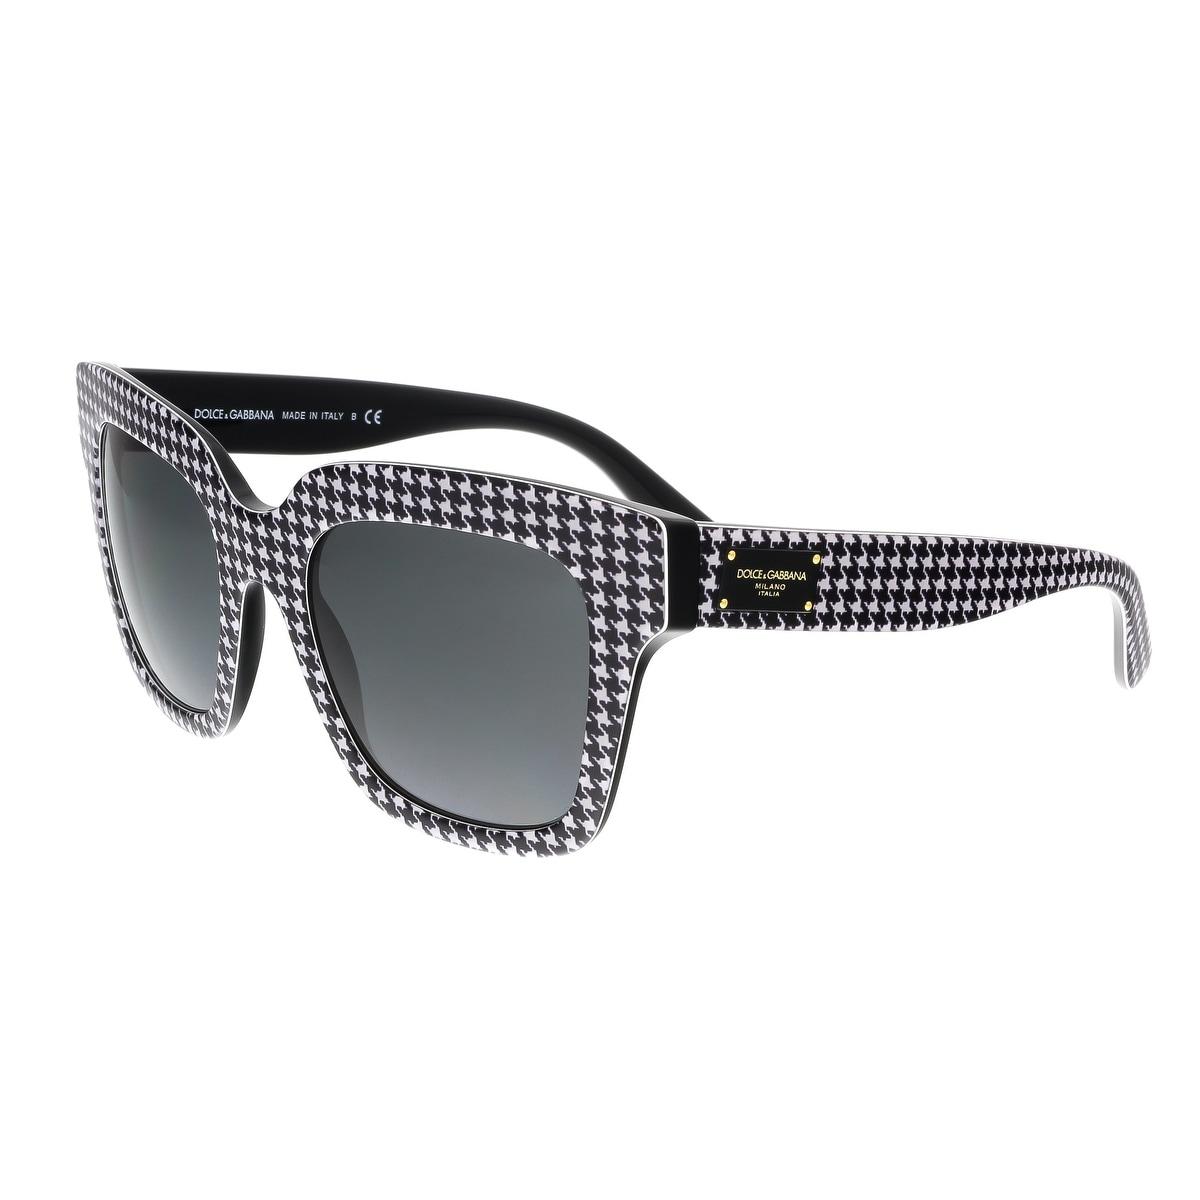 a3fc2eec07 Dolce   Gabbana DG4286 307987 Black White Square Houndstooth Sunglasses